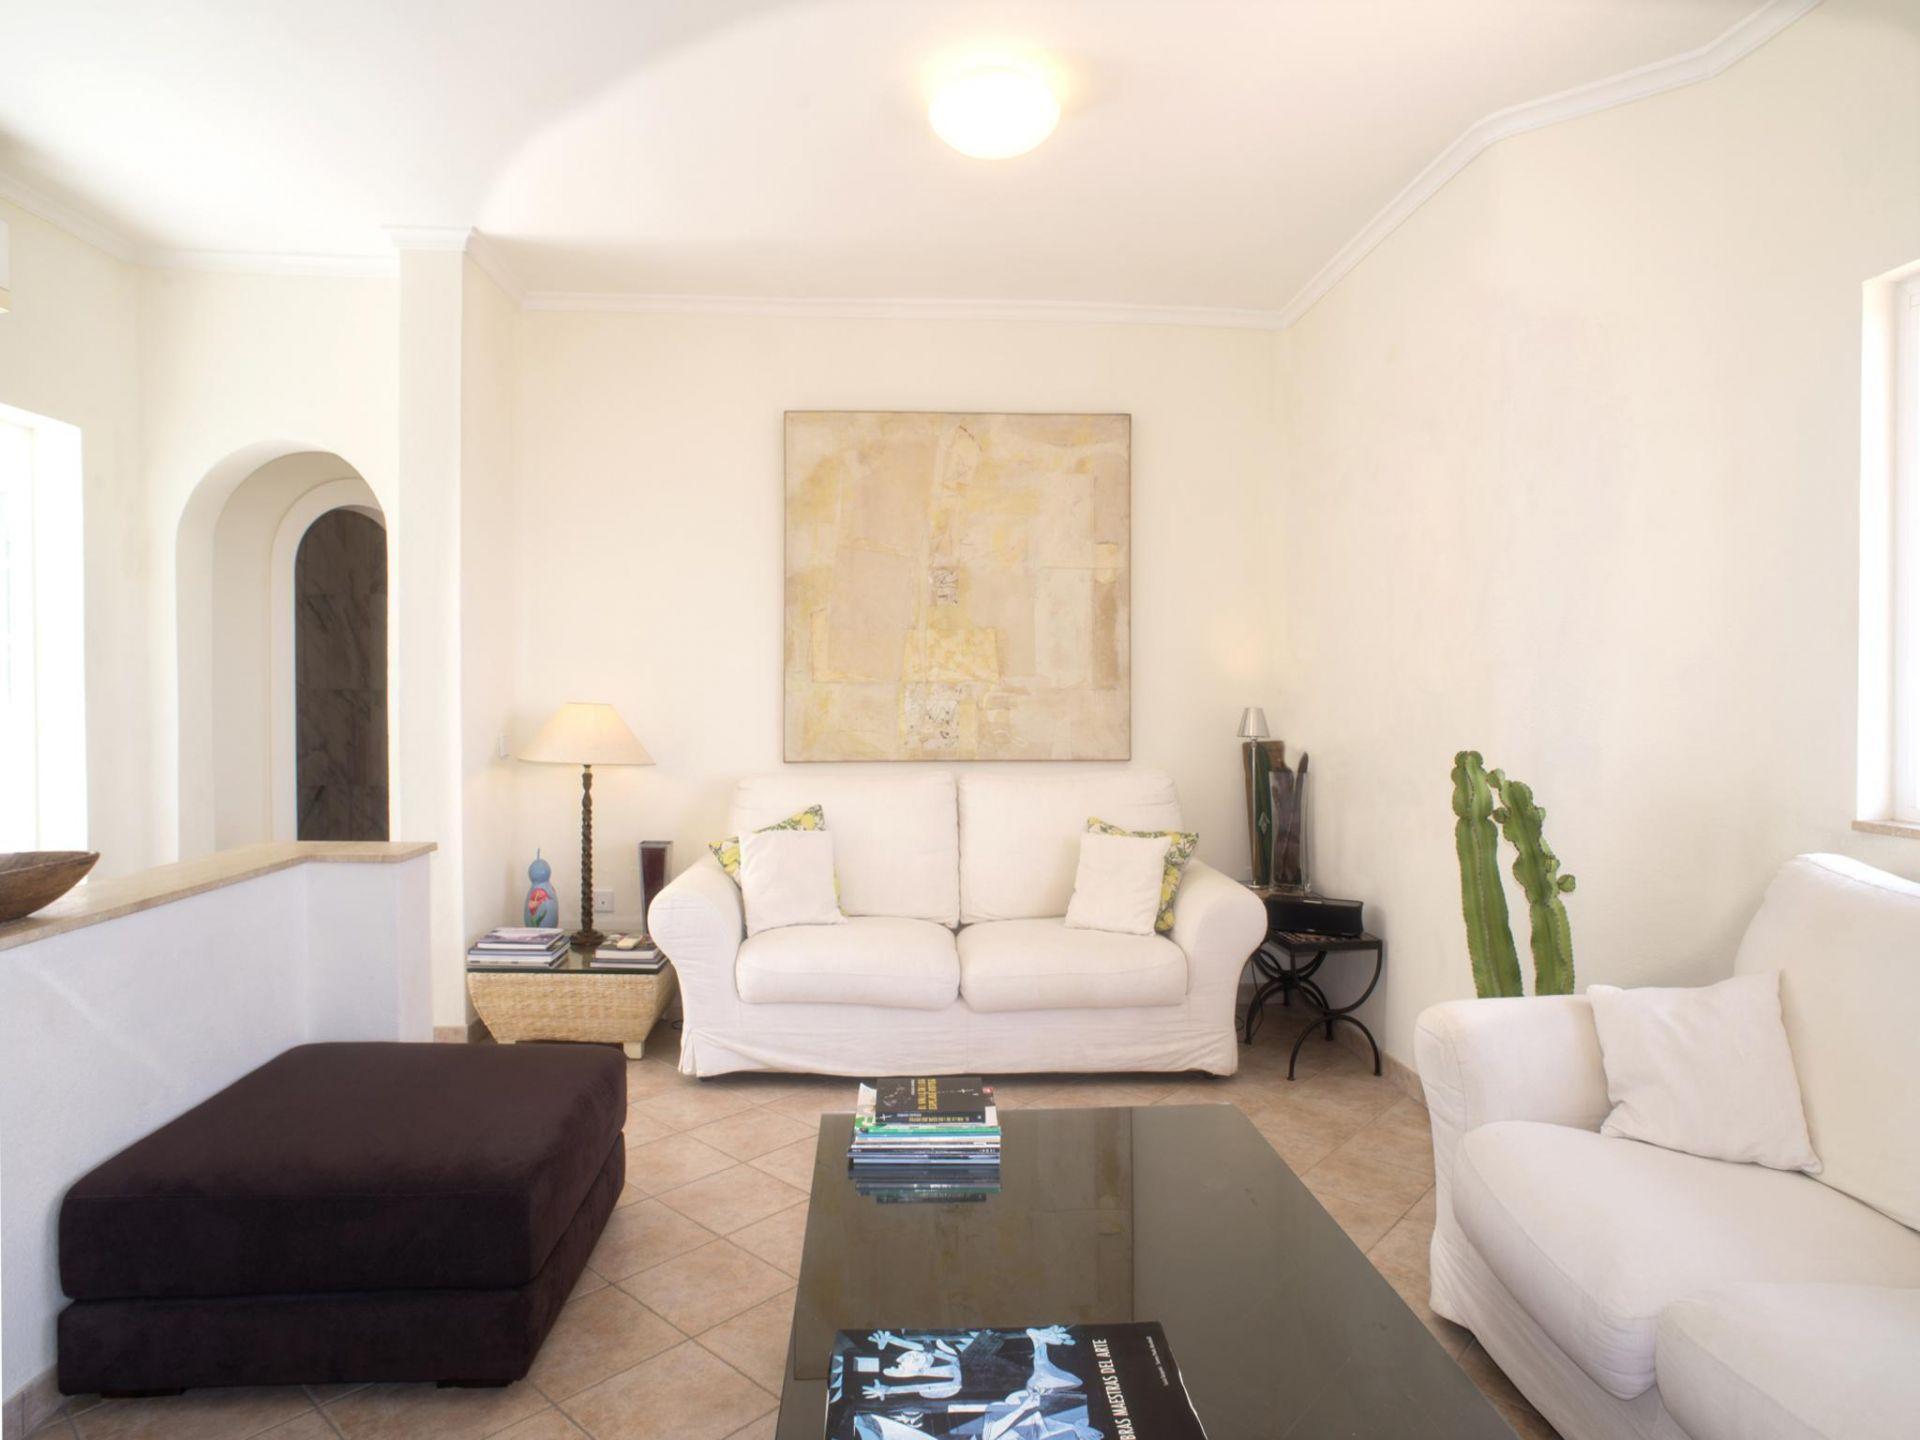 Holiday apartment Villa San Agustin 10 - Holiday Rental (854295), Maspalomas, Gran Canaria, Canary Islands, Spain, picture 13